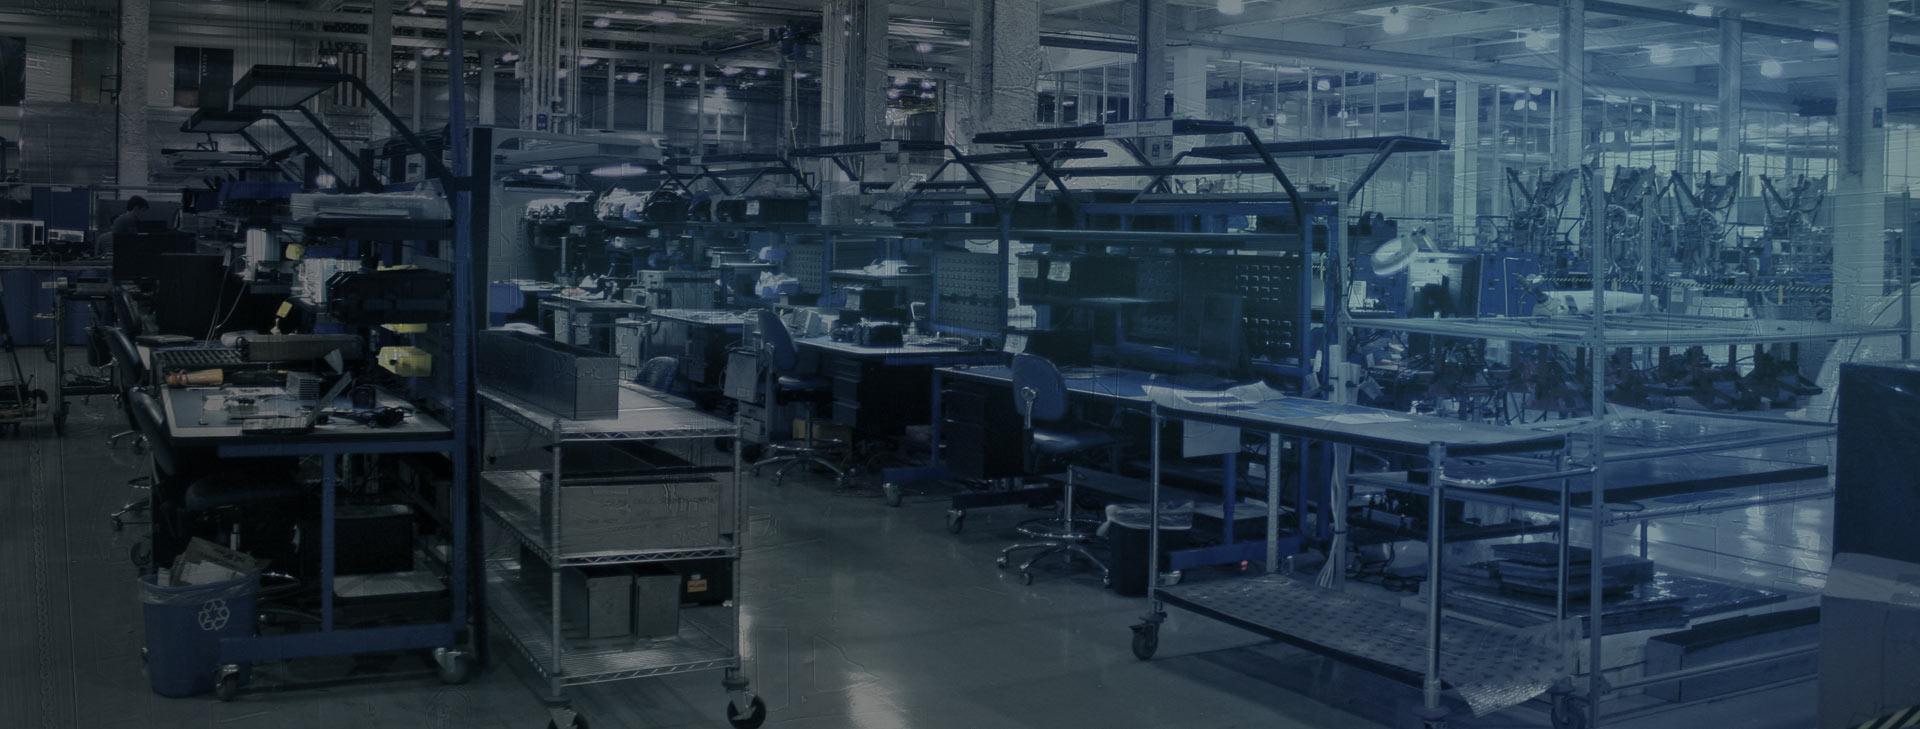 home_factory_subheader